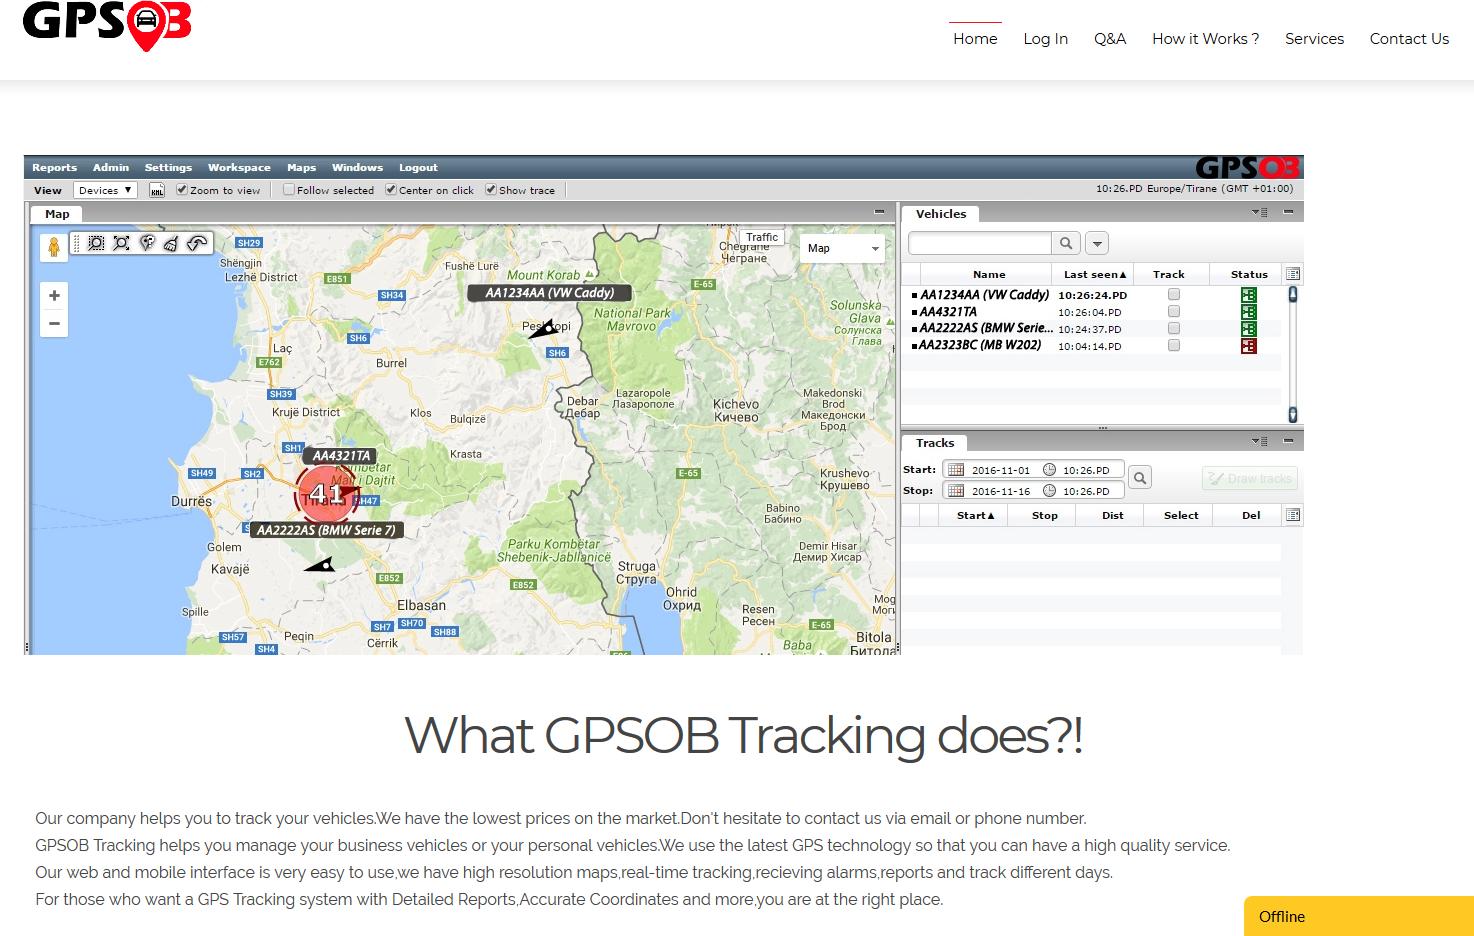 GPSOB Tracking